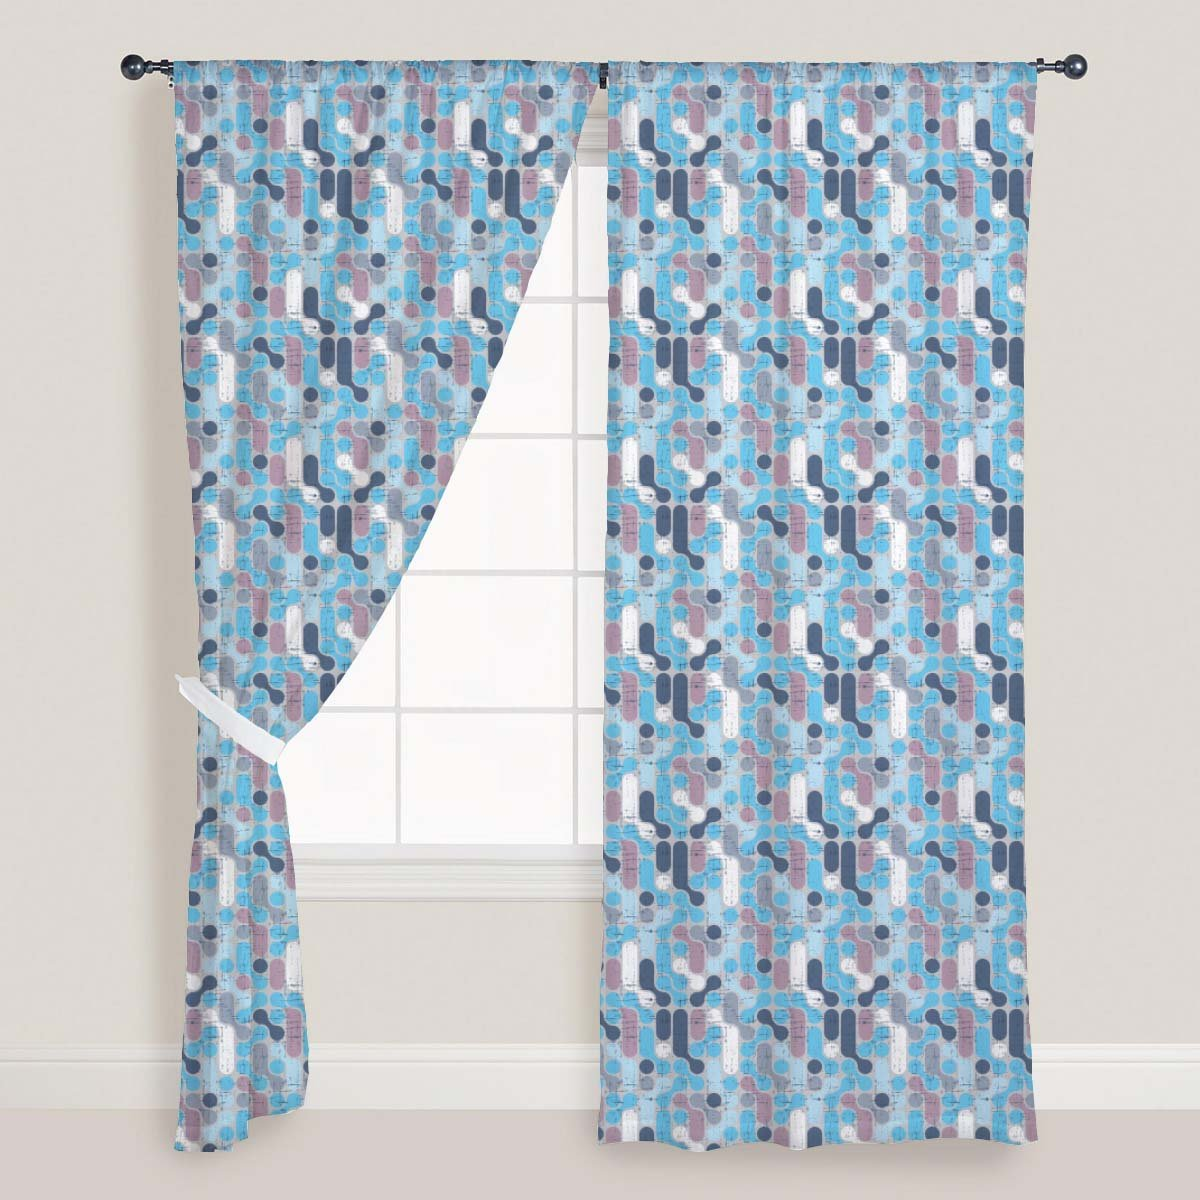 AZ Retro Style Door & Window Curtain Satin 4feet x 9feet; SET OF 3 PCS